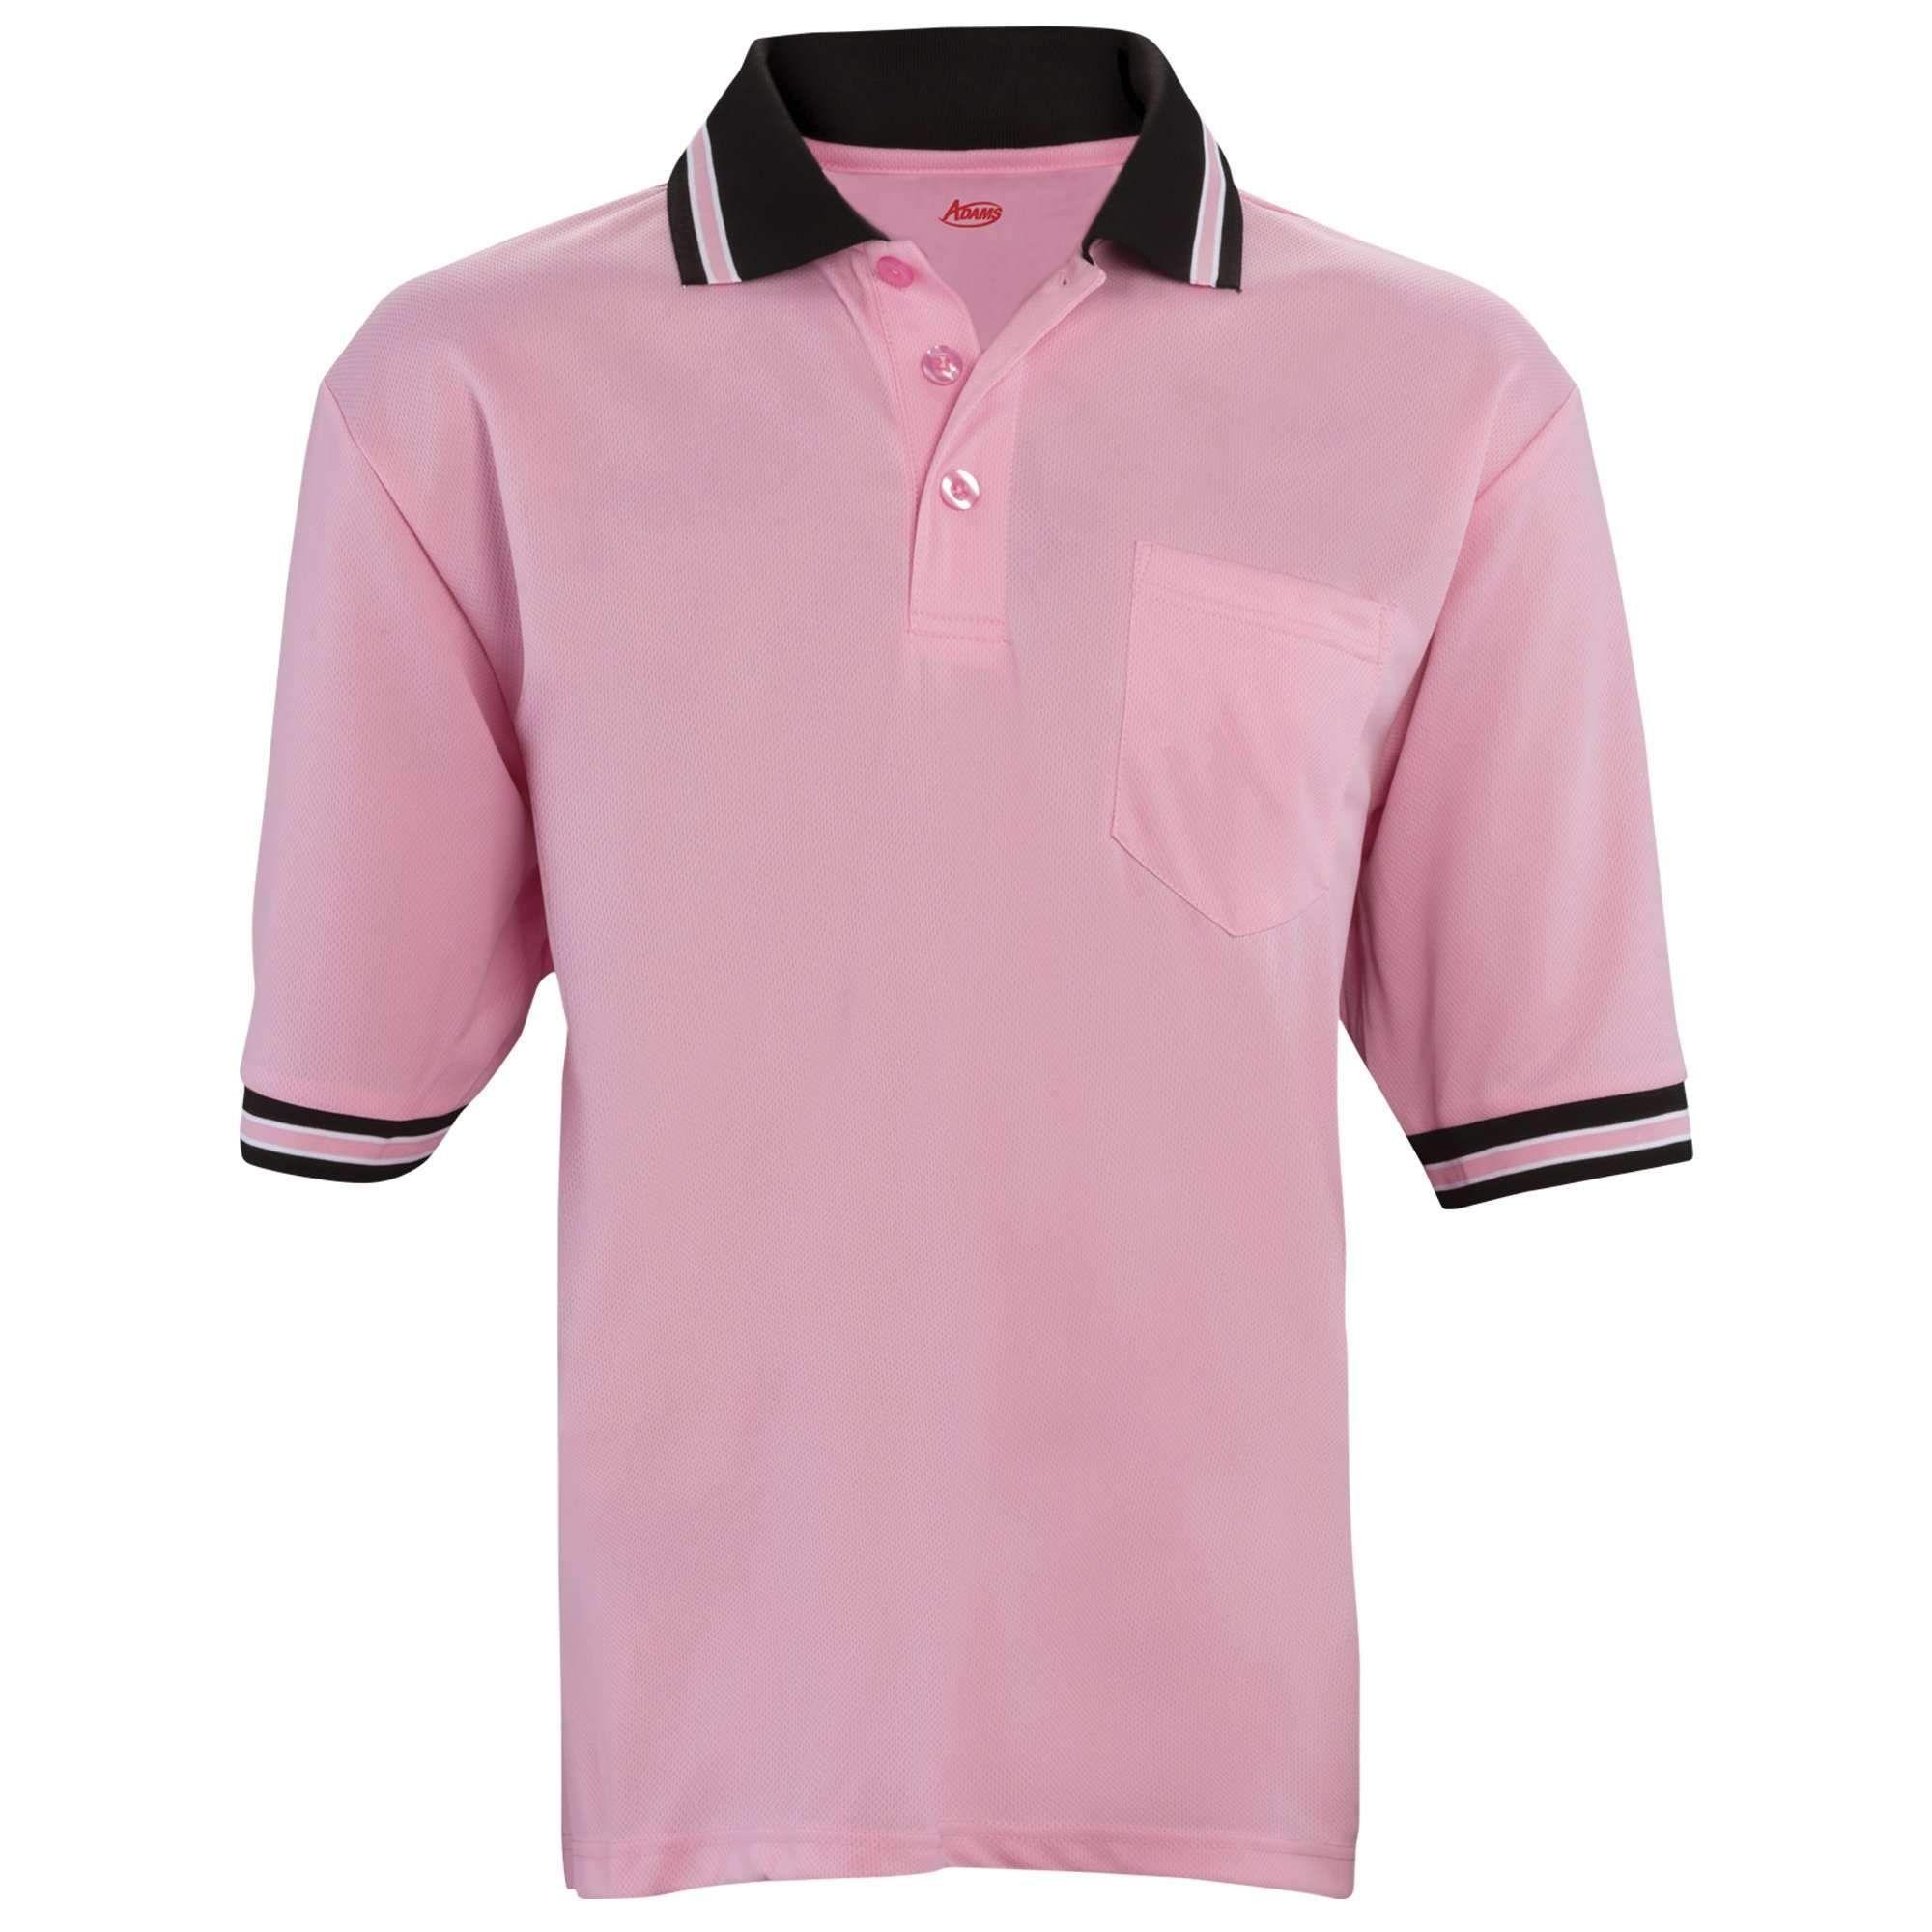 Adams Short Sleeve Umpire Shirt Shirts Shirt Size Usa Shorts